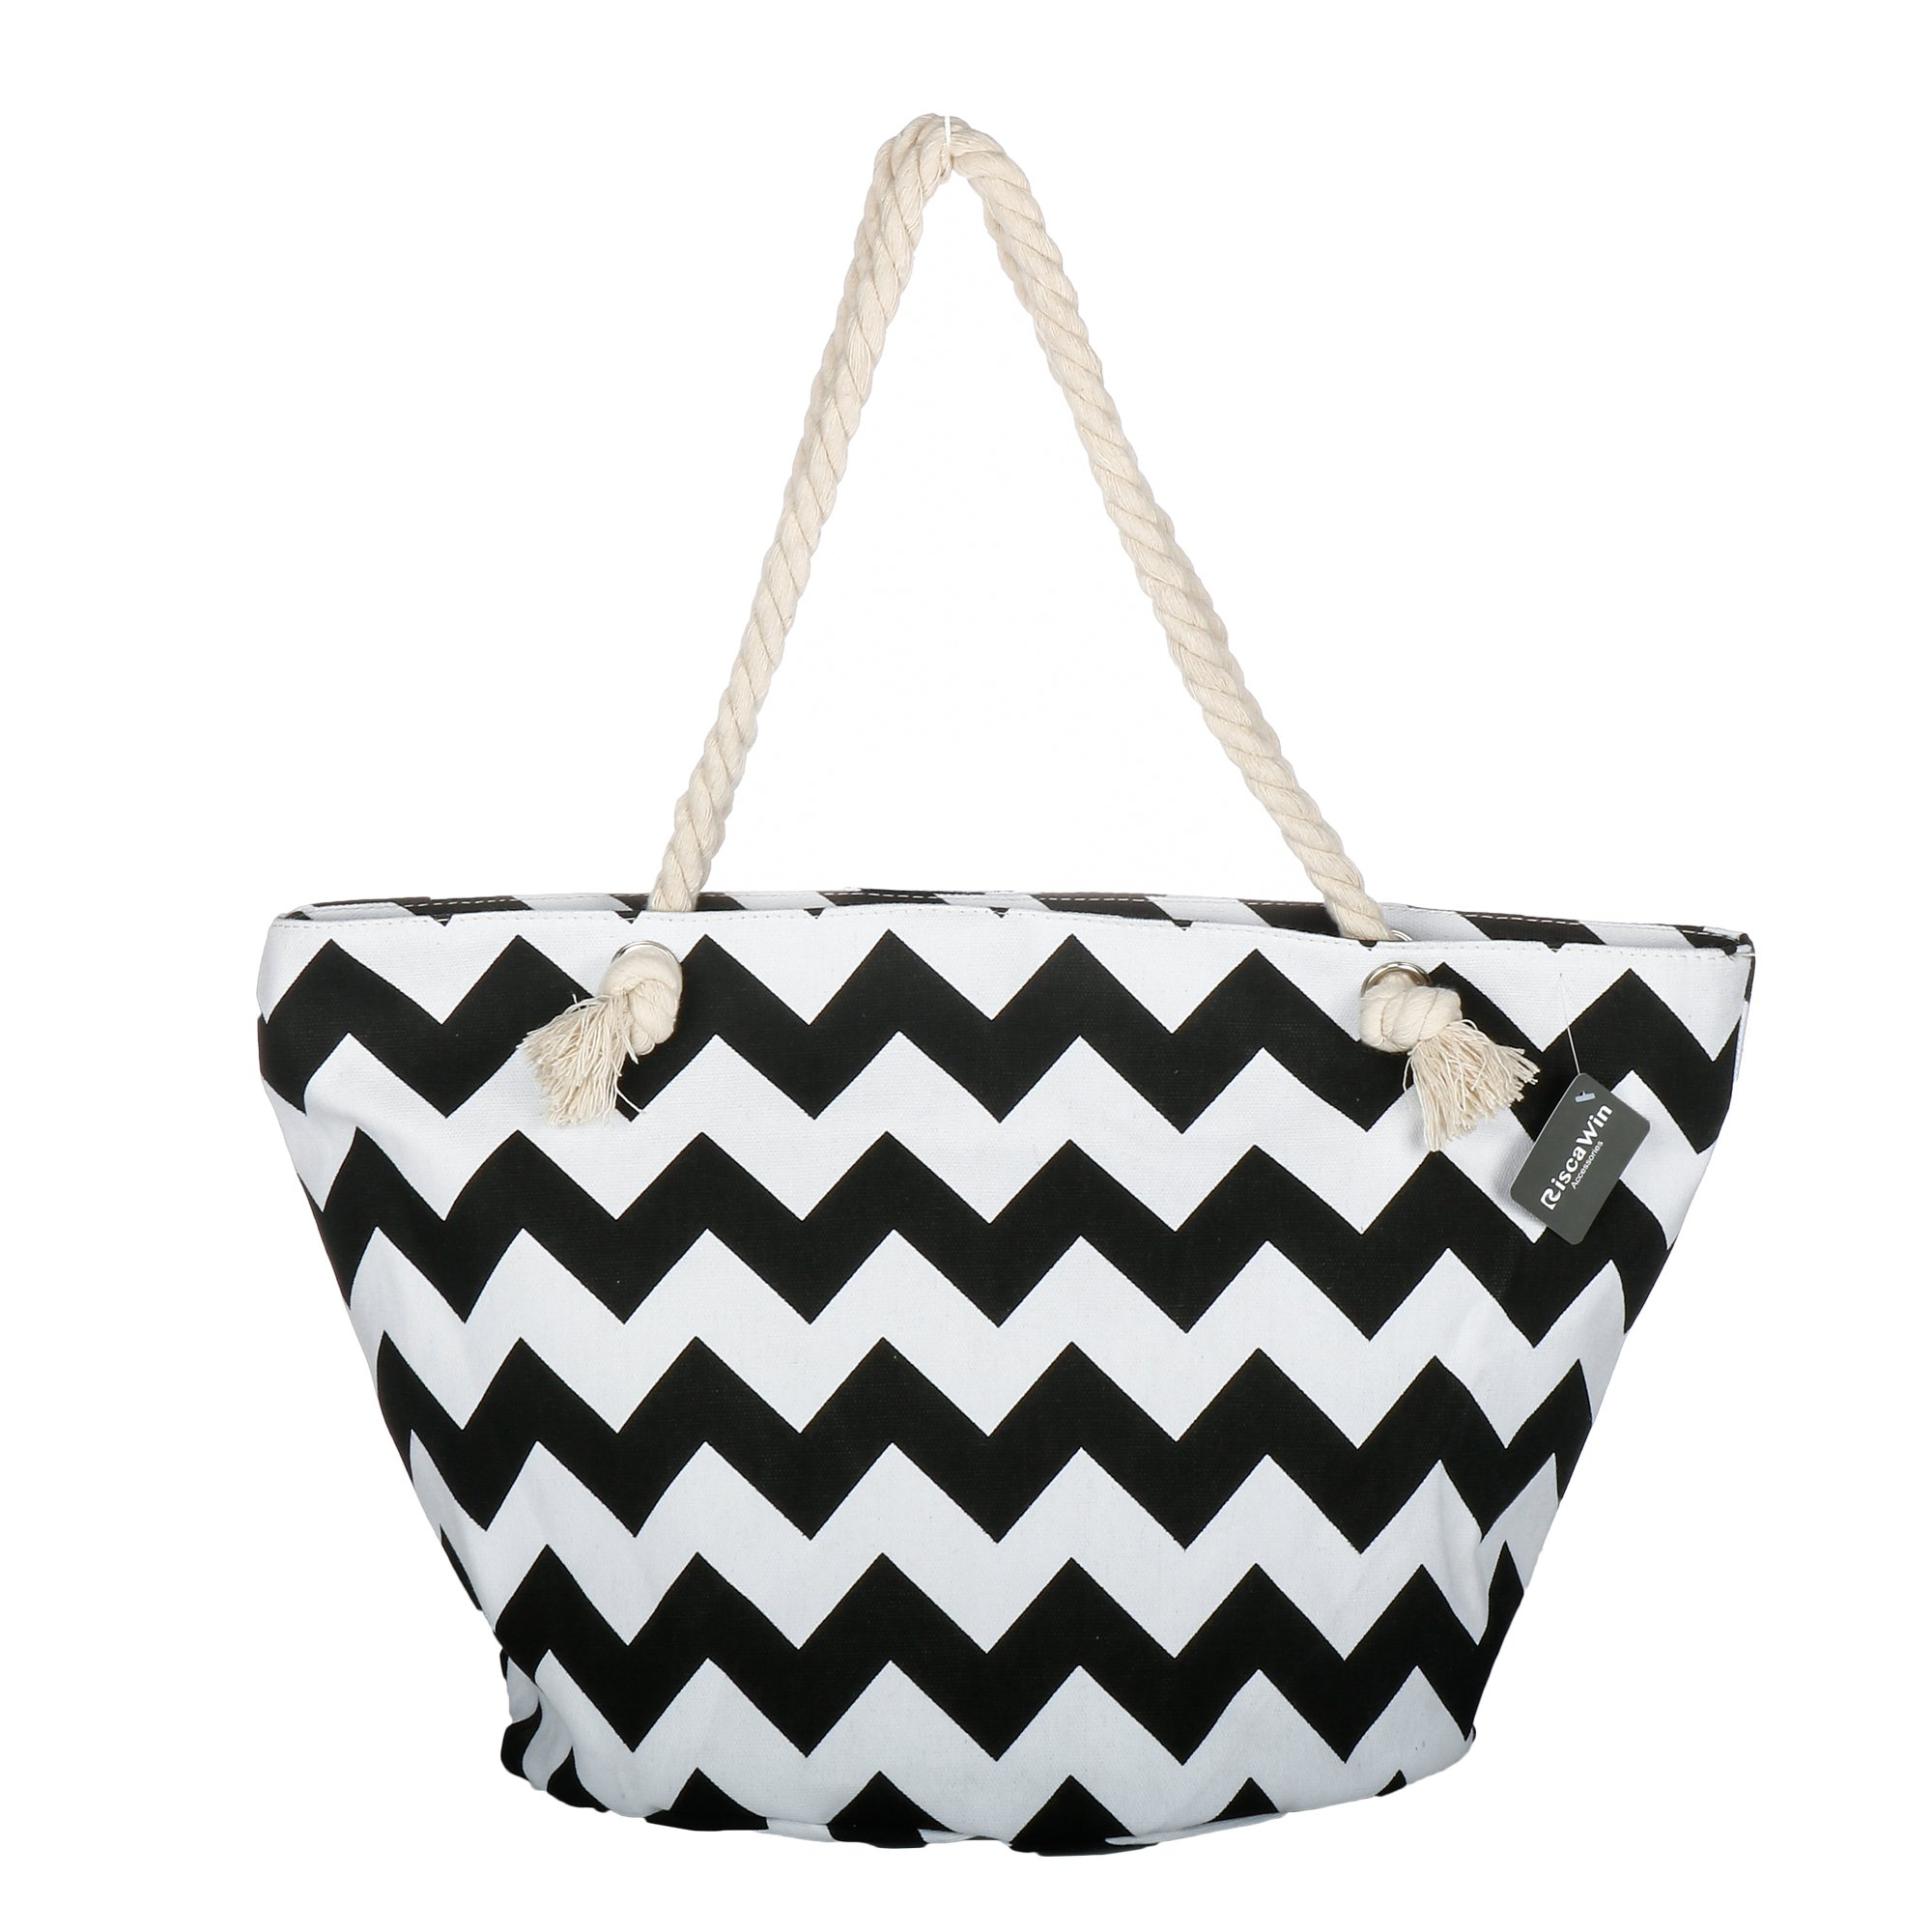 Large Cotton Beach Bag Tote ,RiscaWin Zipper Top Rope Handles Beach Bag(Black Chevron)